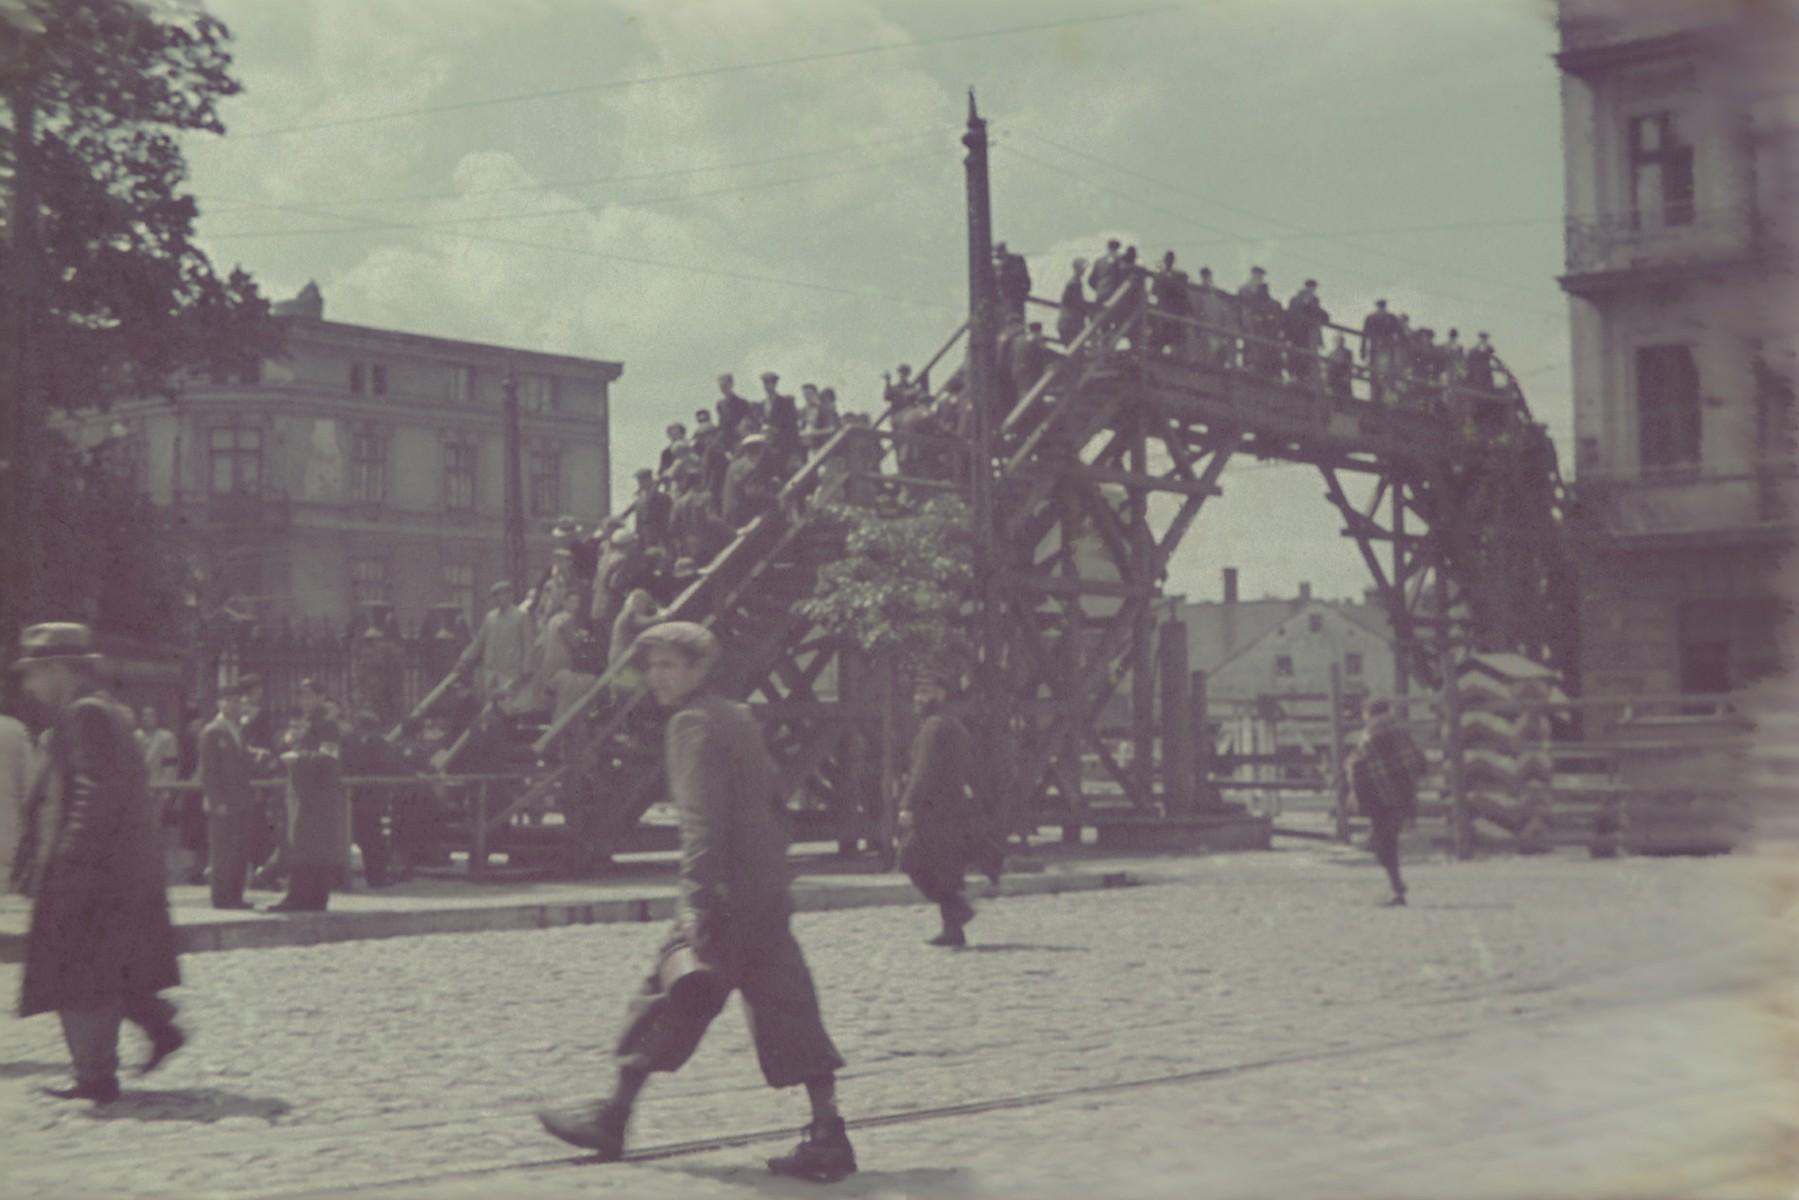 View of Lodz ghetto residents crossing the pedestrian bridge over Zgierska Street at Koscielny Square.